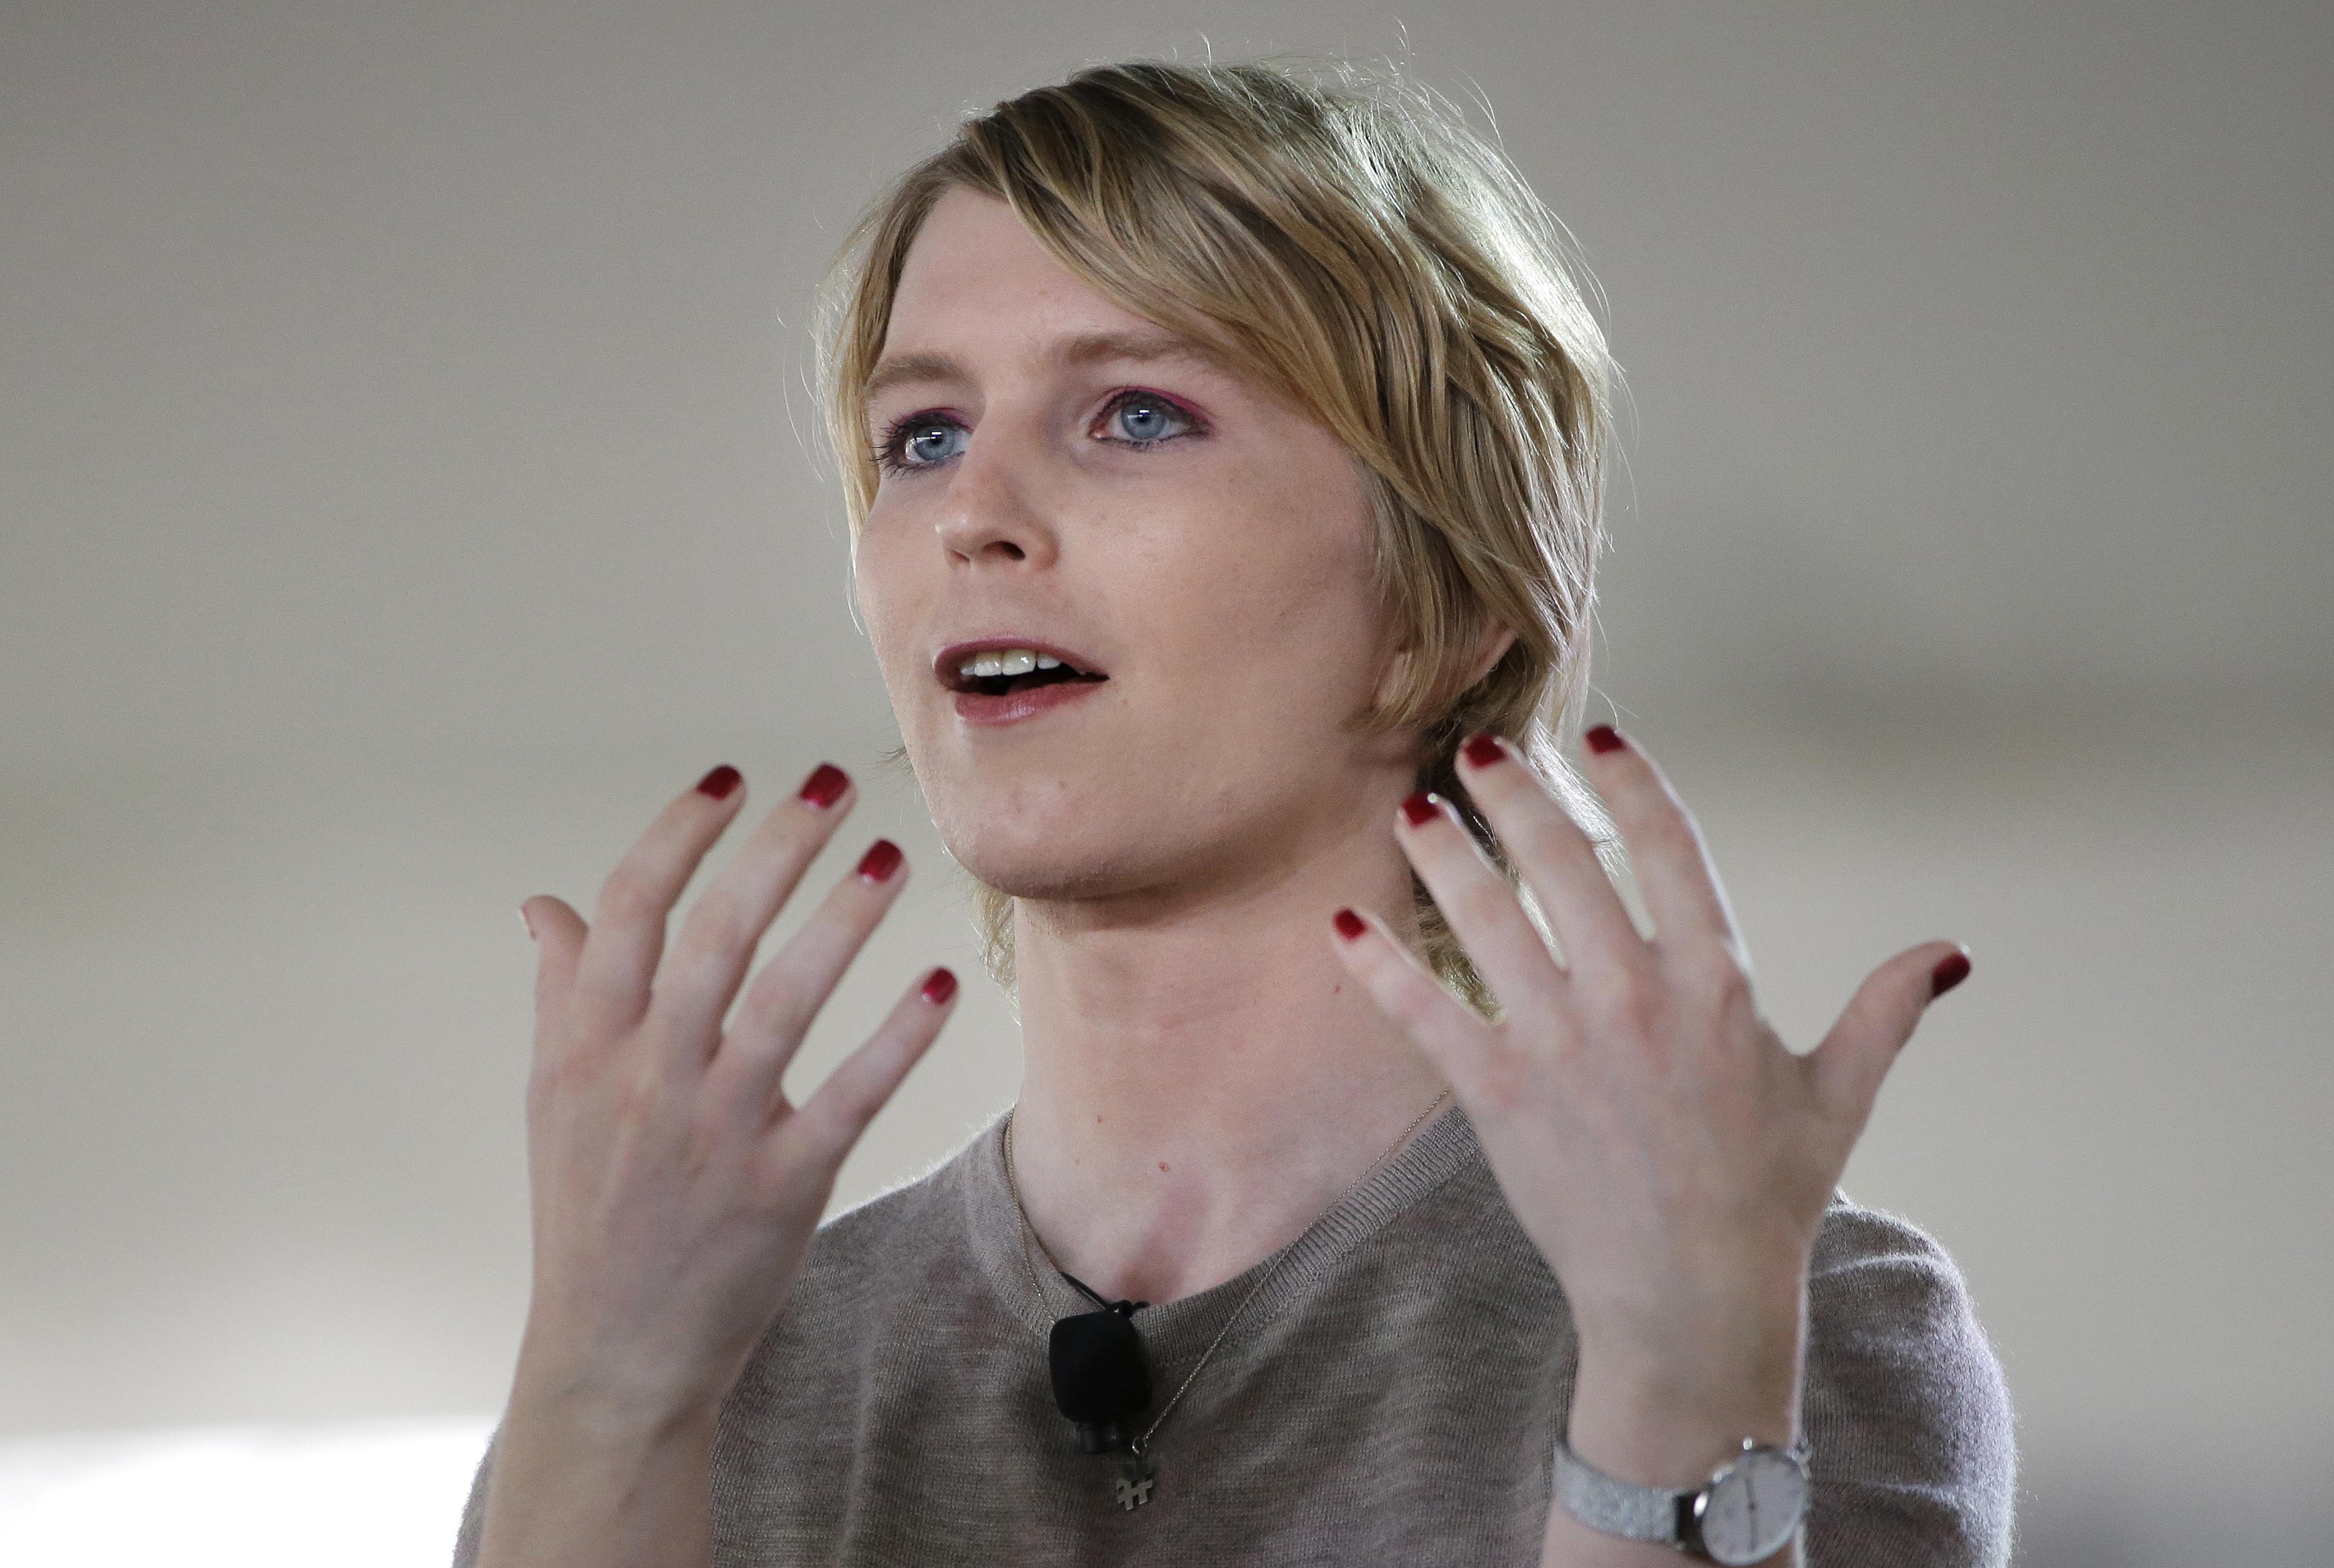 Westlake Legal Group chelsea_manning_senate_bid_16921 Chelsea Manning files for U.S. Senate bid in Maryland 197